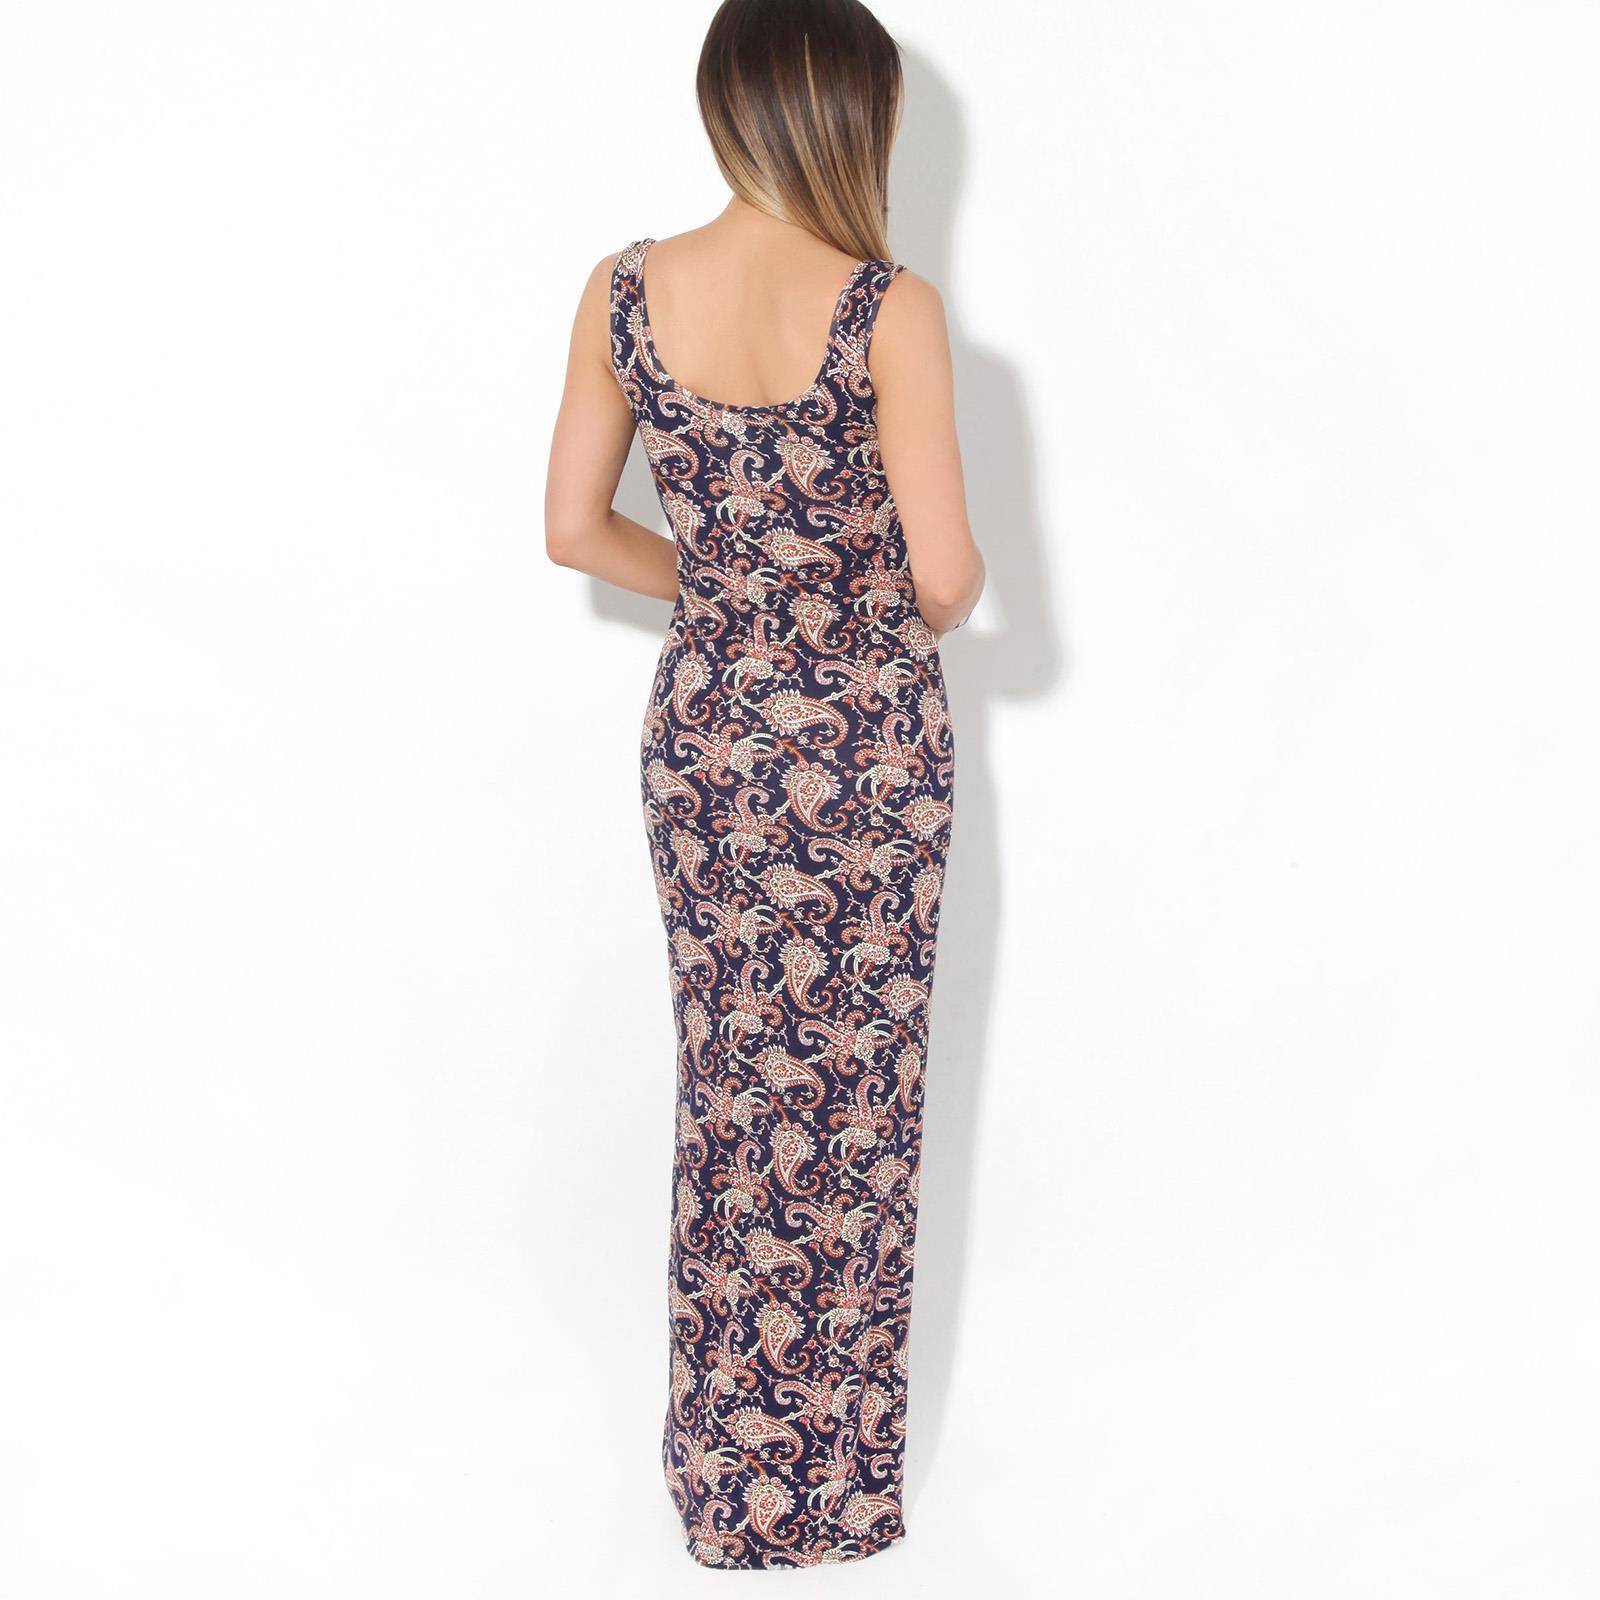 Womens-Ladies-Floral-Bodycon-Maxi-Long-Sun-Dress-Sleeveless-Pattern-Summer-Beach thumbnail 7